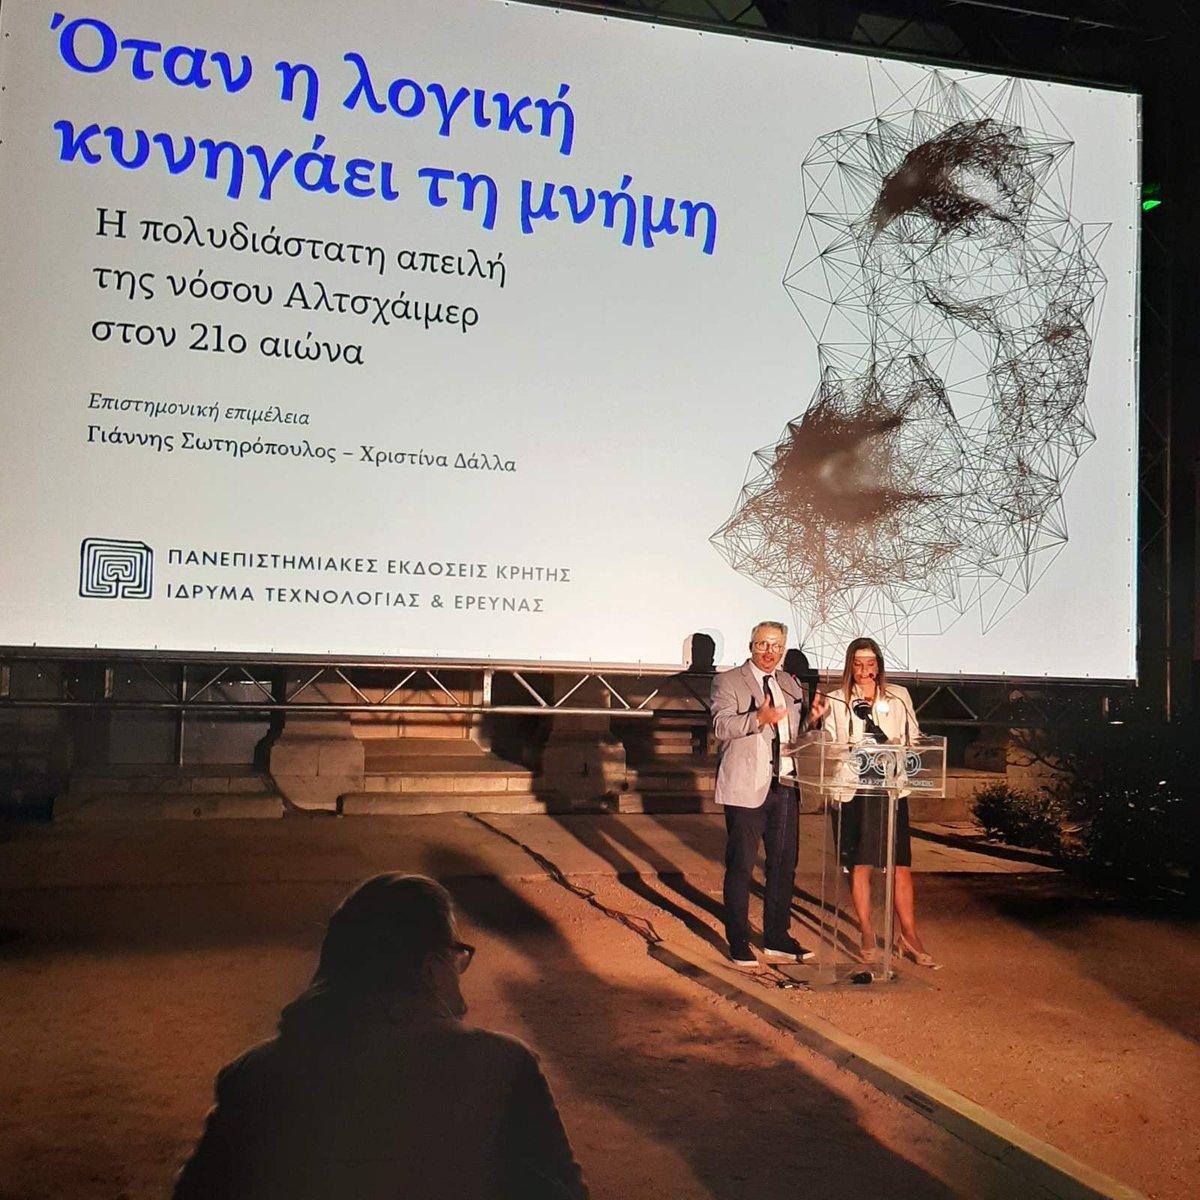 "Ioannis Sotiropoulos on Twitter: ""..παρουσίαζοντας μαζί με την Χριστίνα Δάλλα το βιβλίο για την νόσο Αλτσχάιμερ, γραμμένο για το ευρύ κοινό από τις Πανεπιστήμιο. Εκδόσεις Κρήτης.… https://t.co/jqUf7OSufY"""